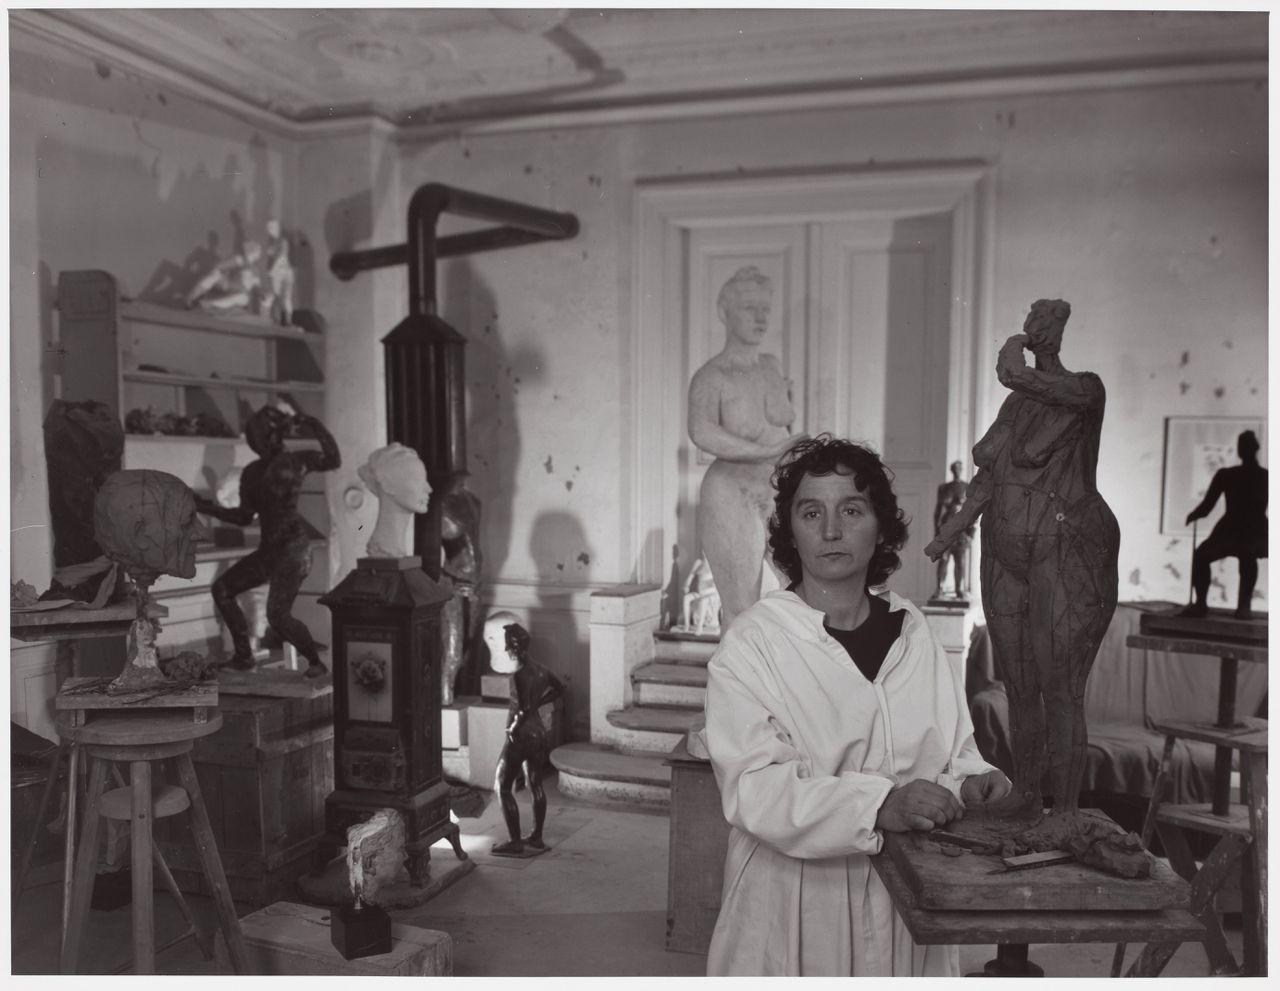 Germaine Richier in haar atelier in Zurich, 1944.